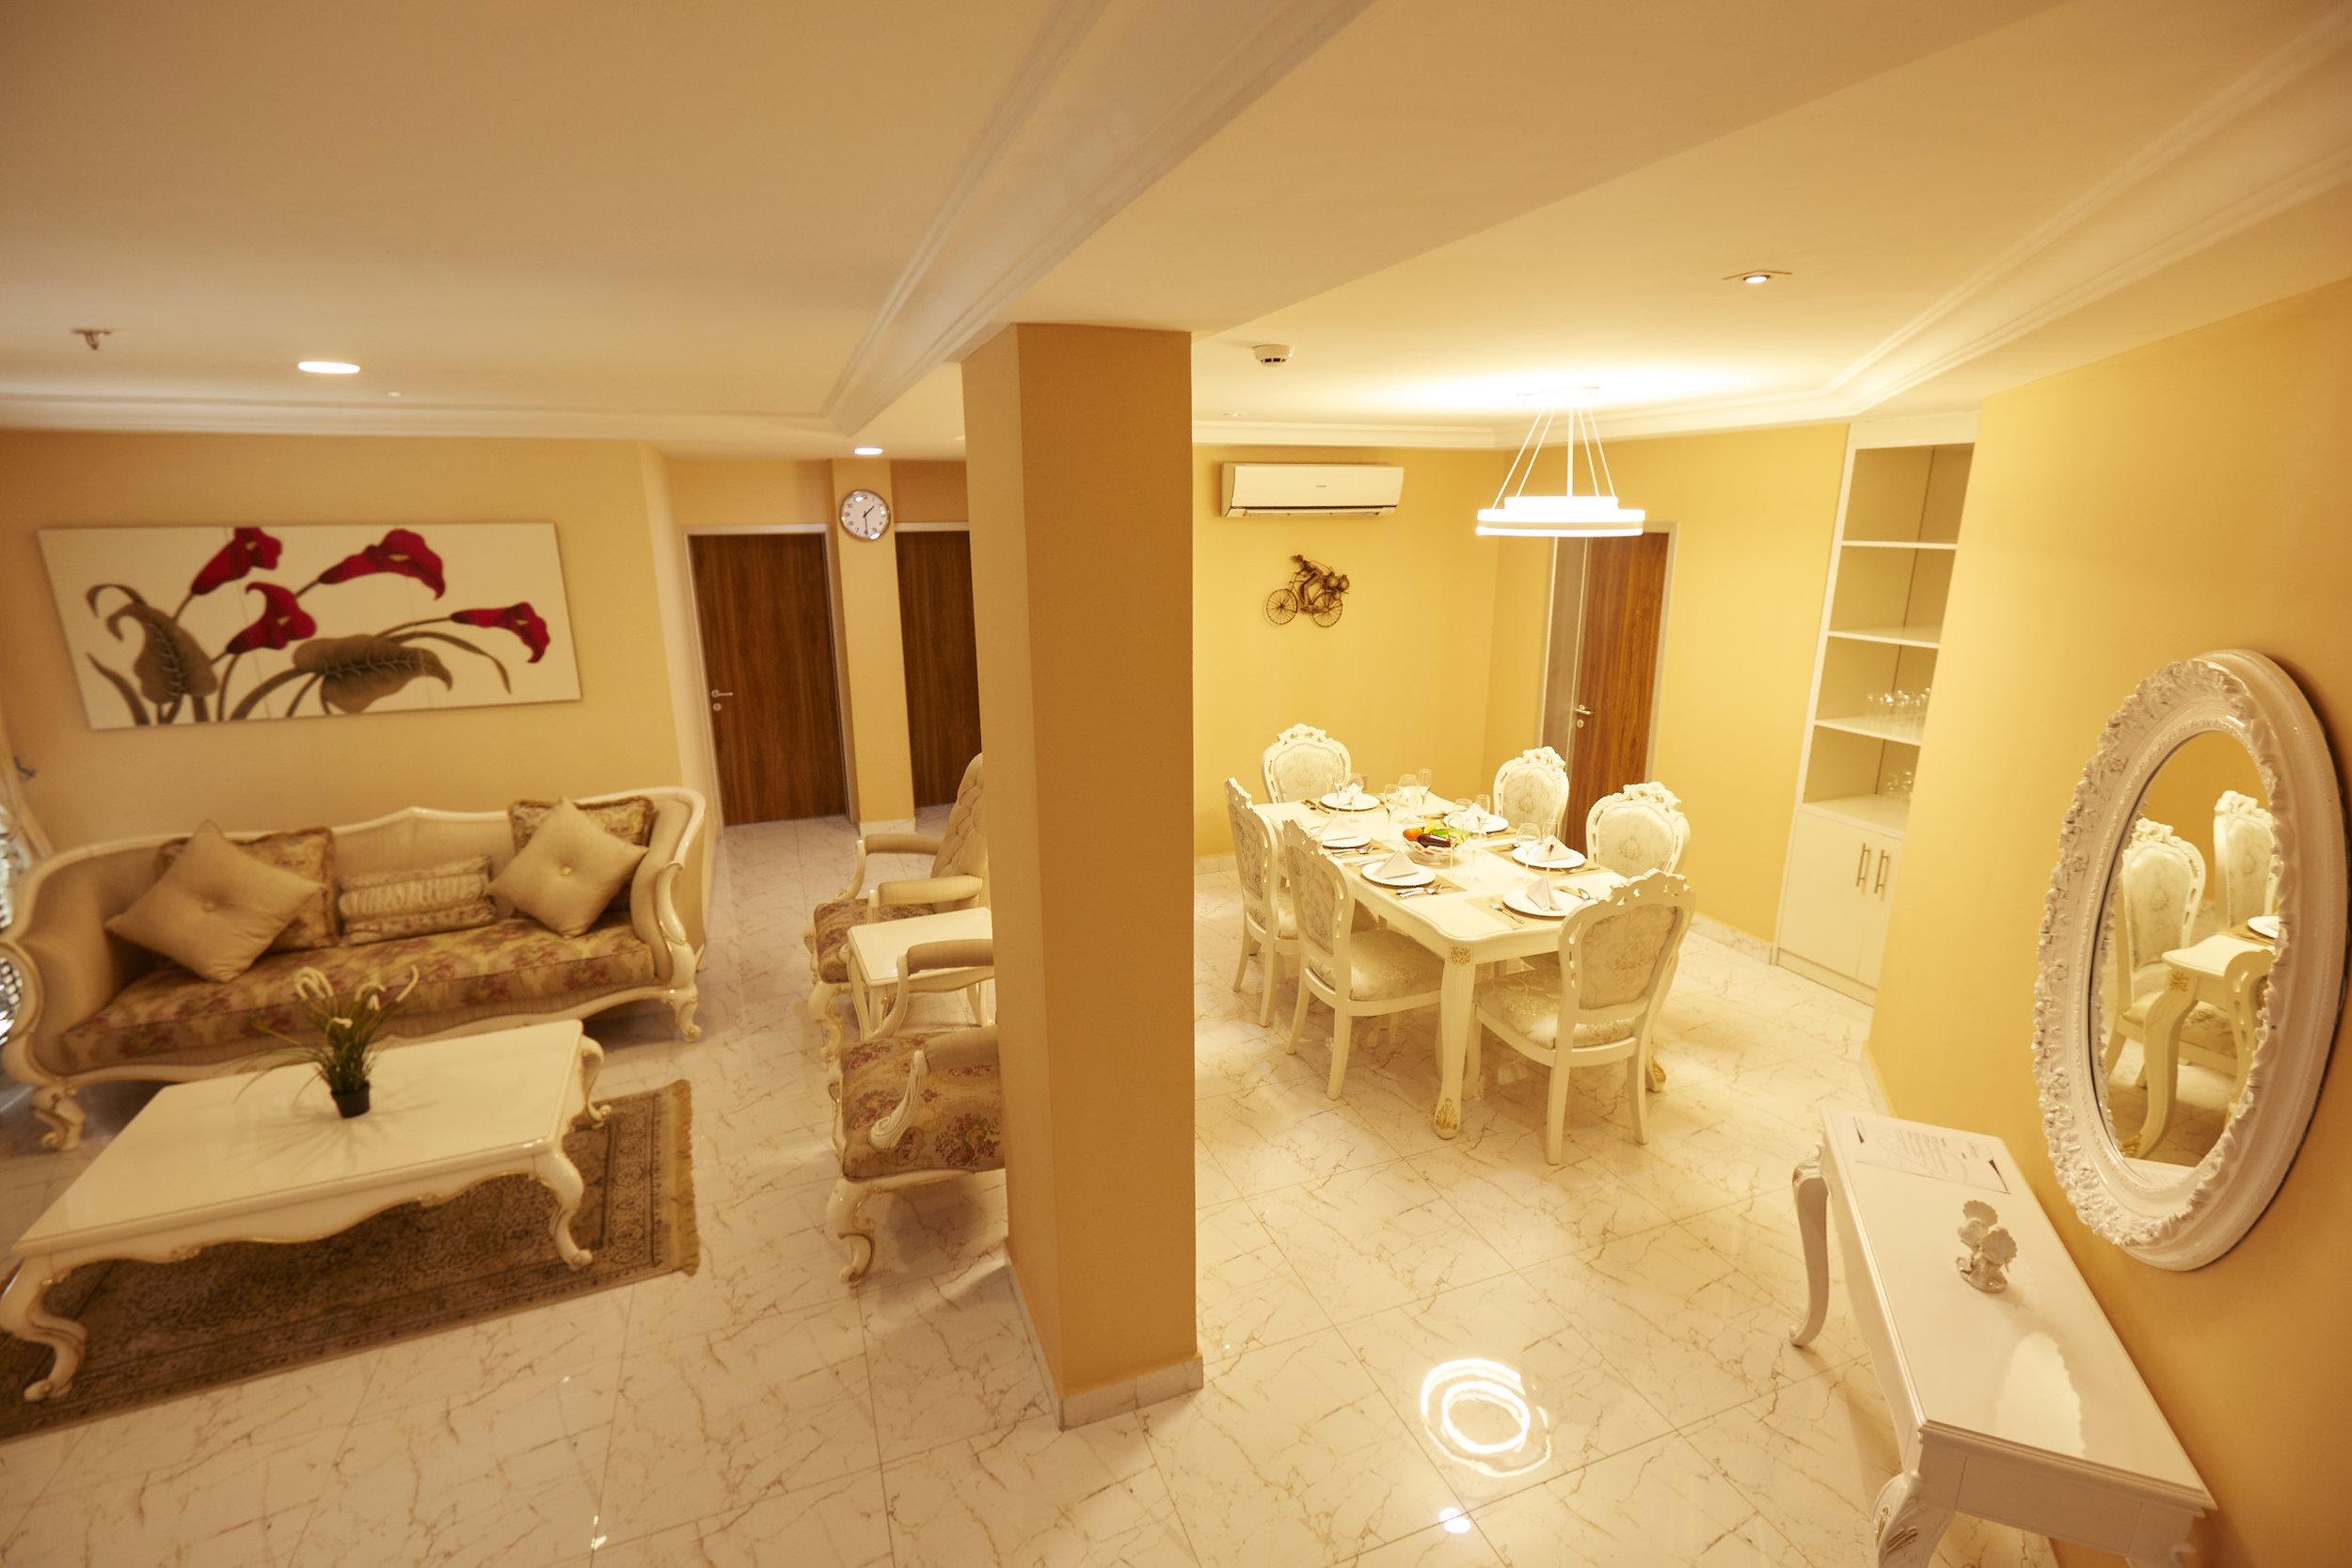 2 Bed Royale Dining : Living Room 1 .jpg